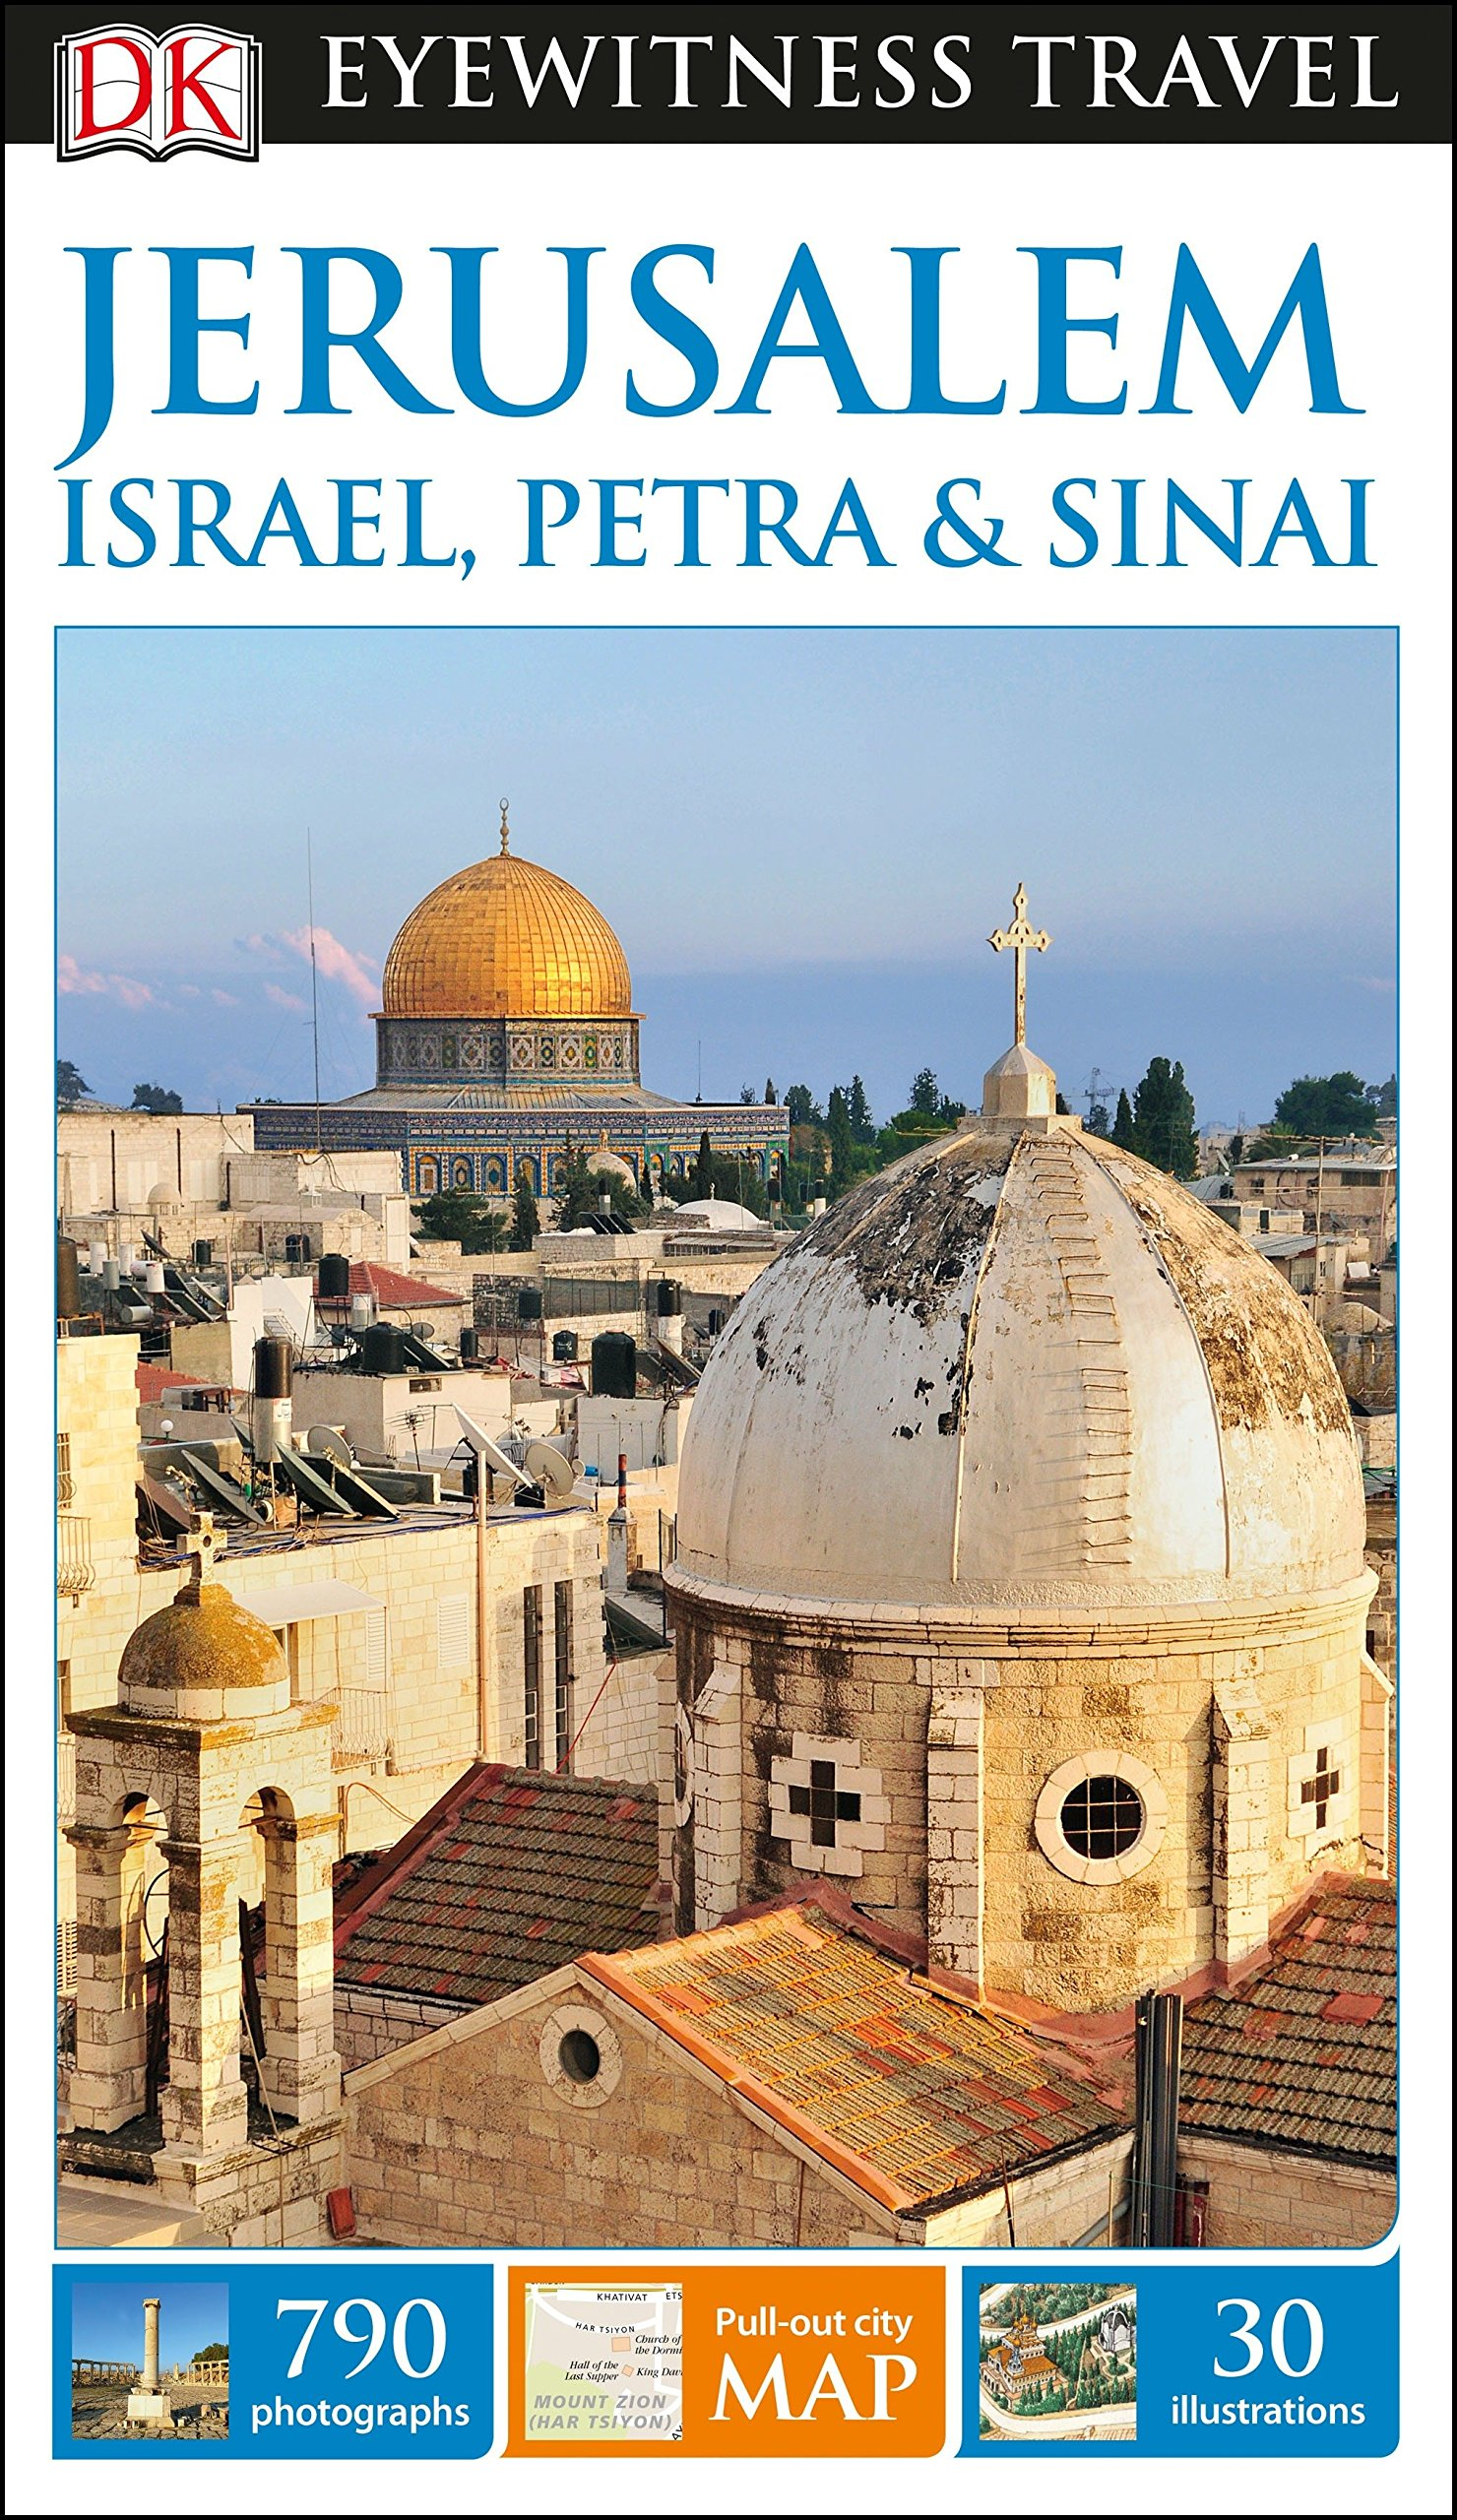 DK Eyewitness Travel Guide Jerusalem, Israel, Petra and Sinai by DK Eyewitness Travel